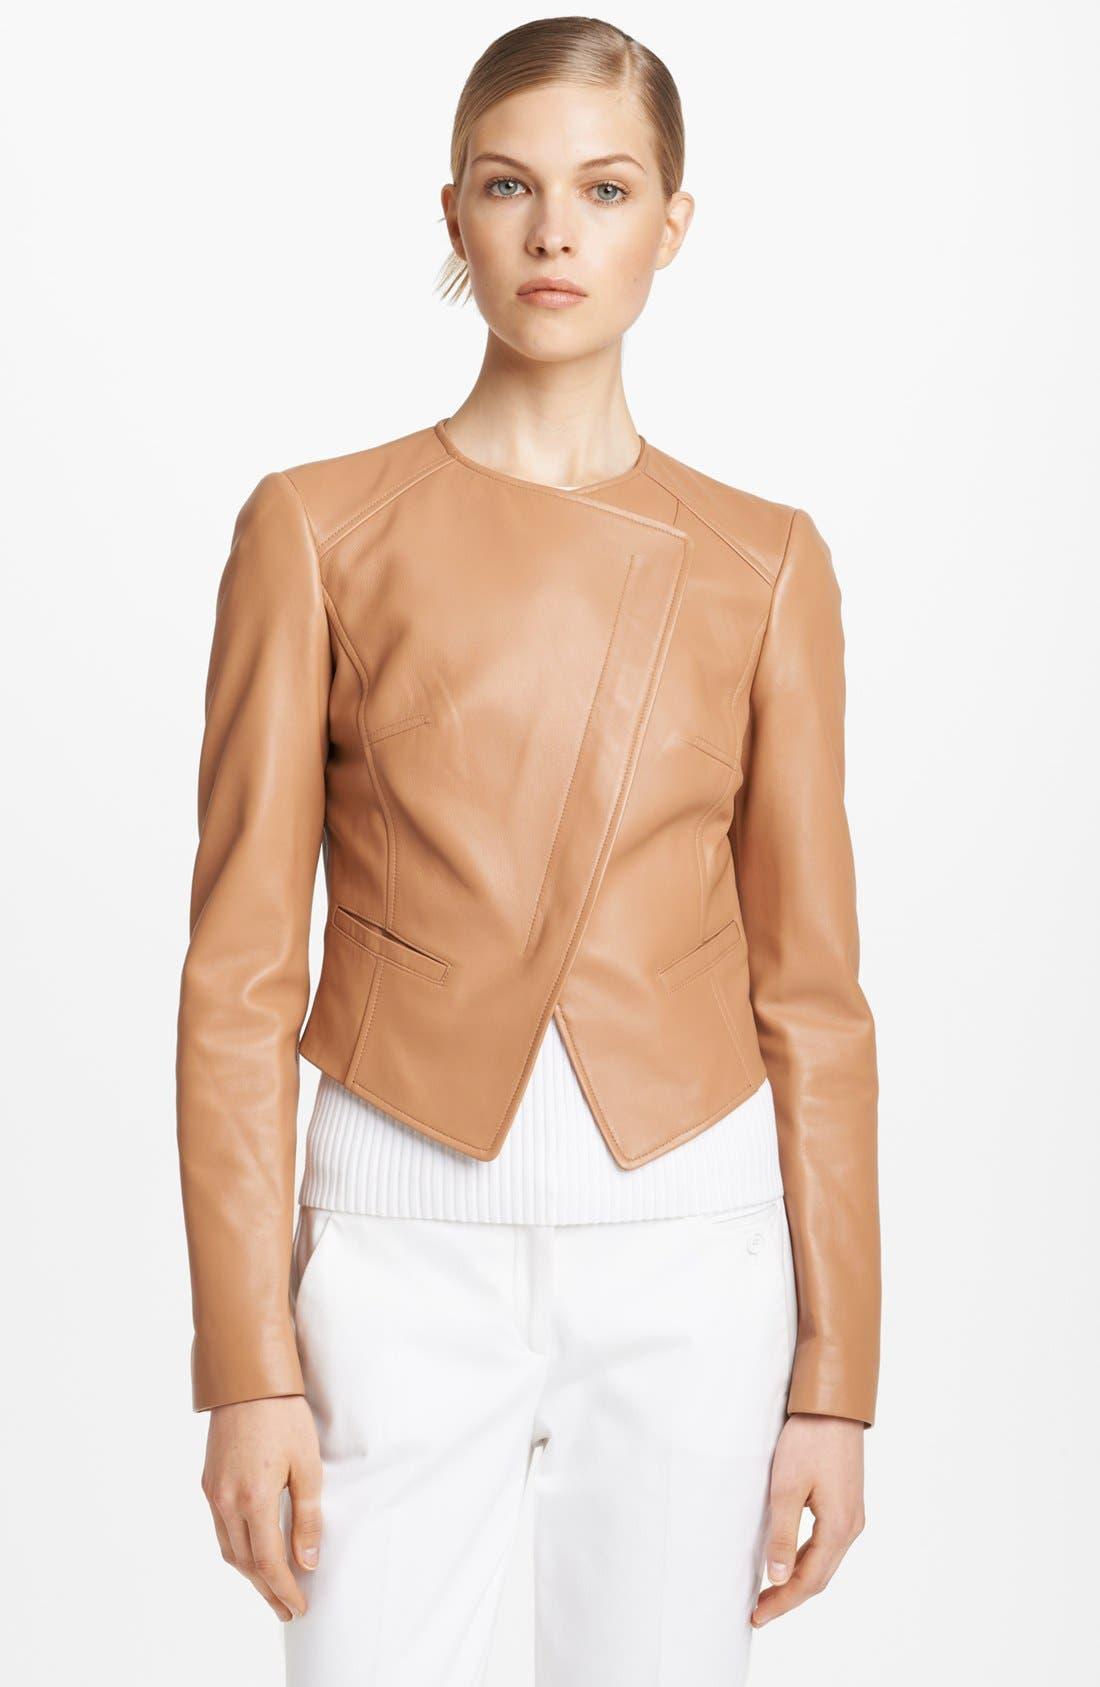 Alternate Image 1 Selected - Michael Kors Plonge Leather Jacket